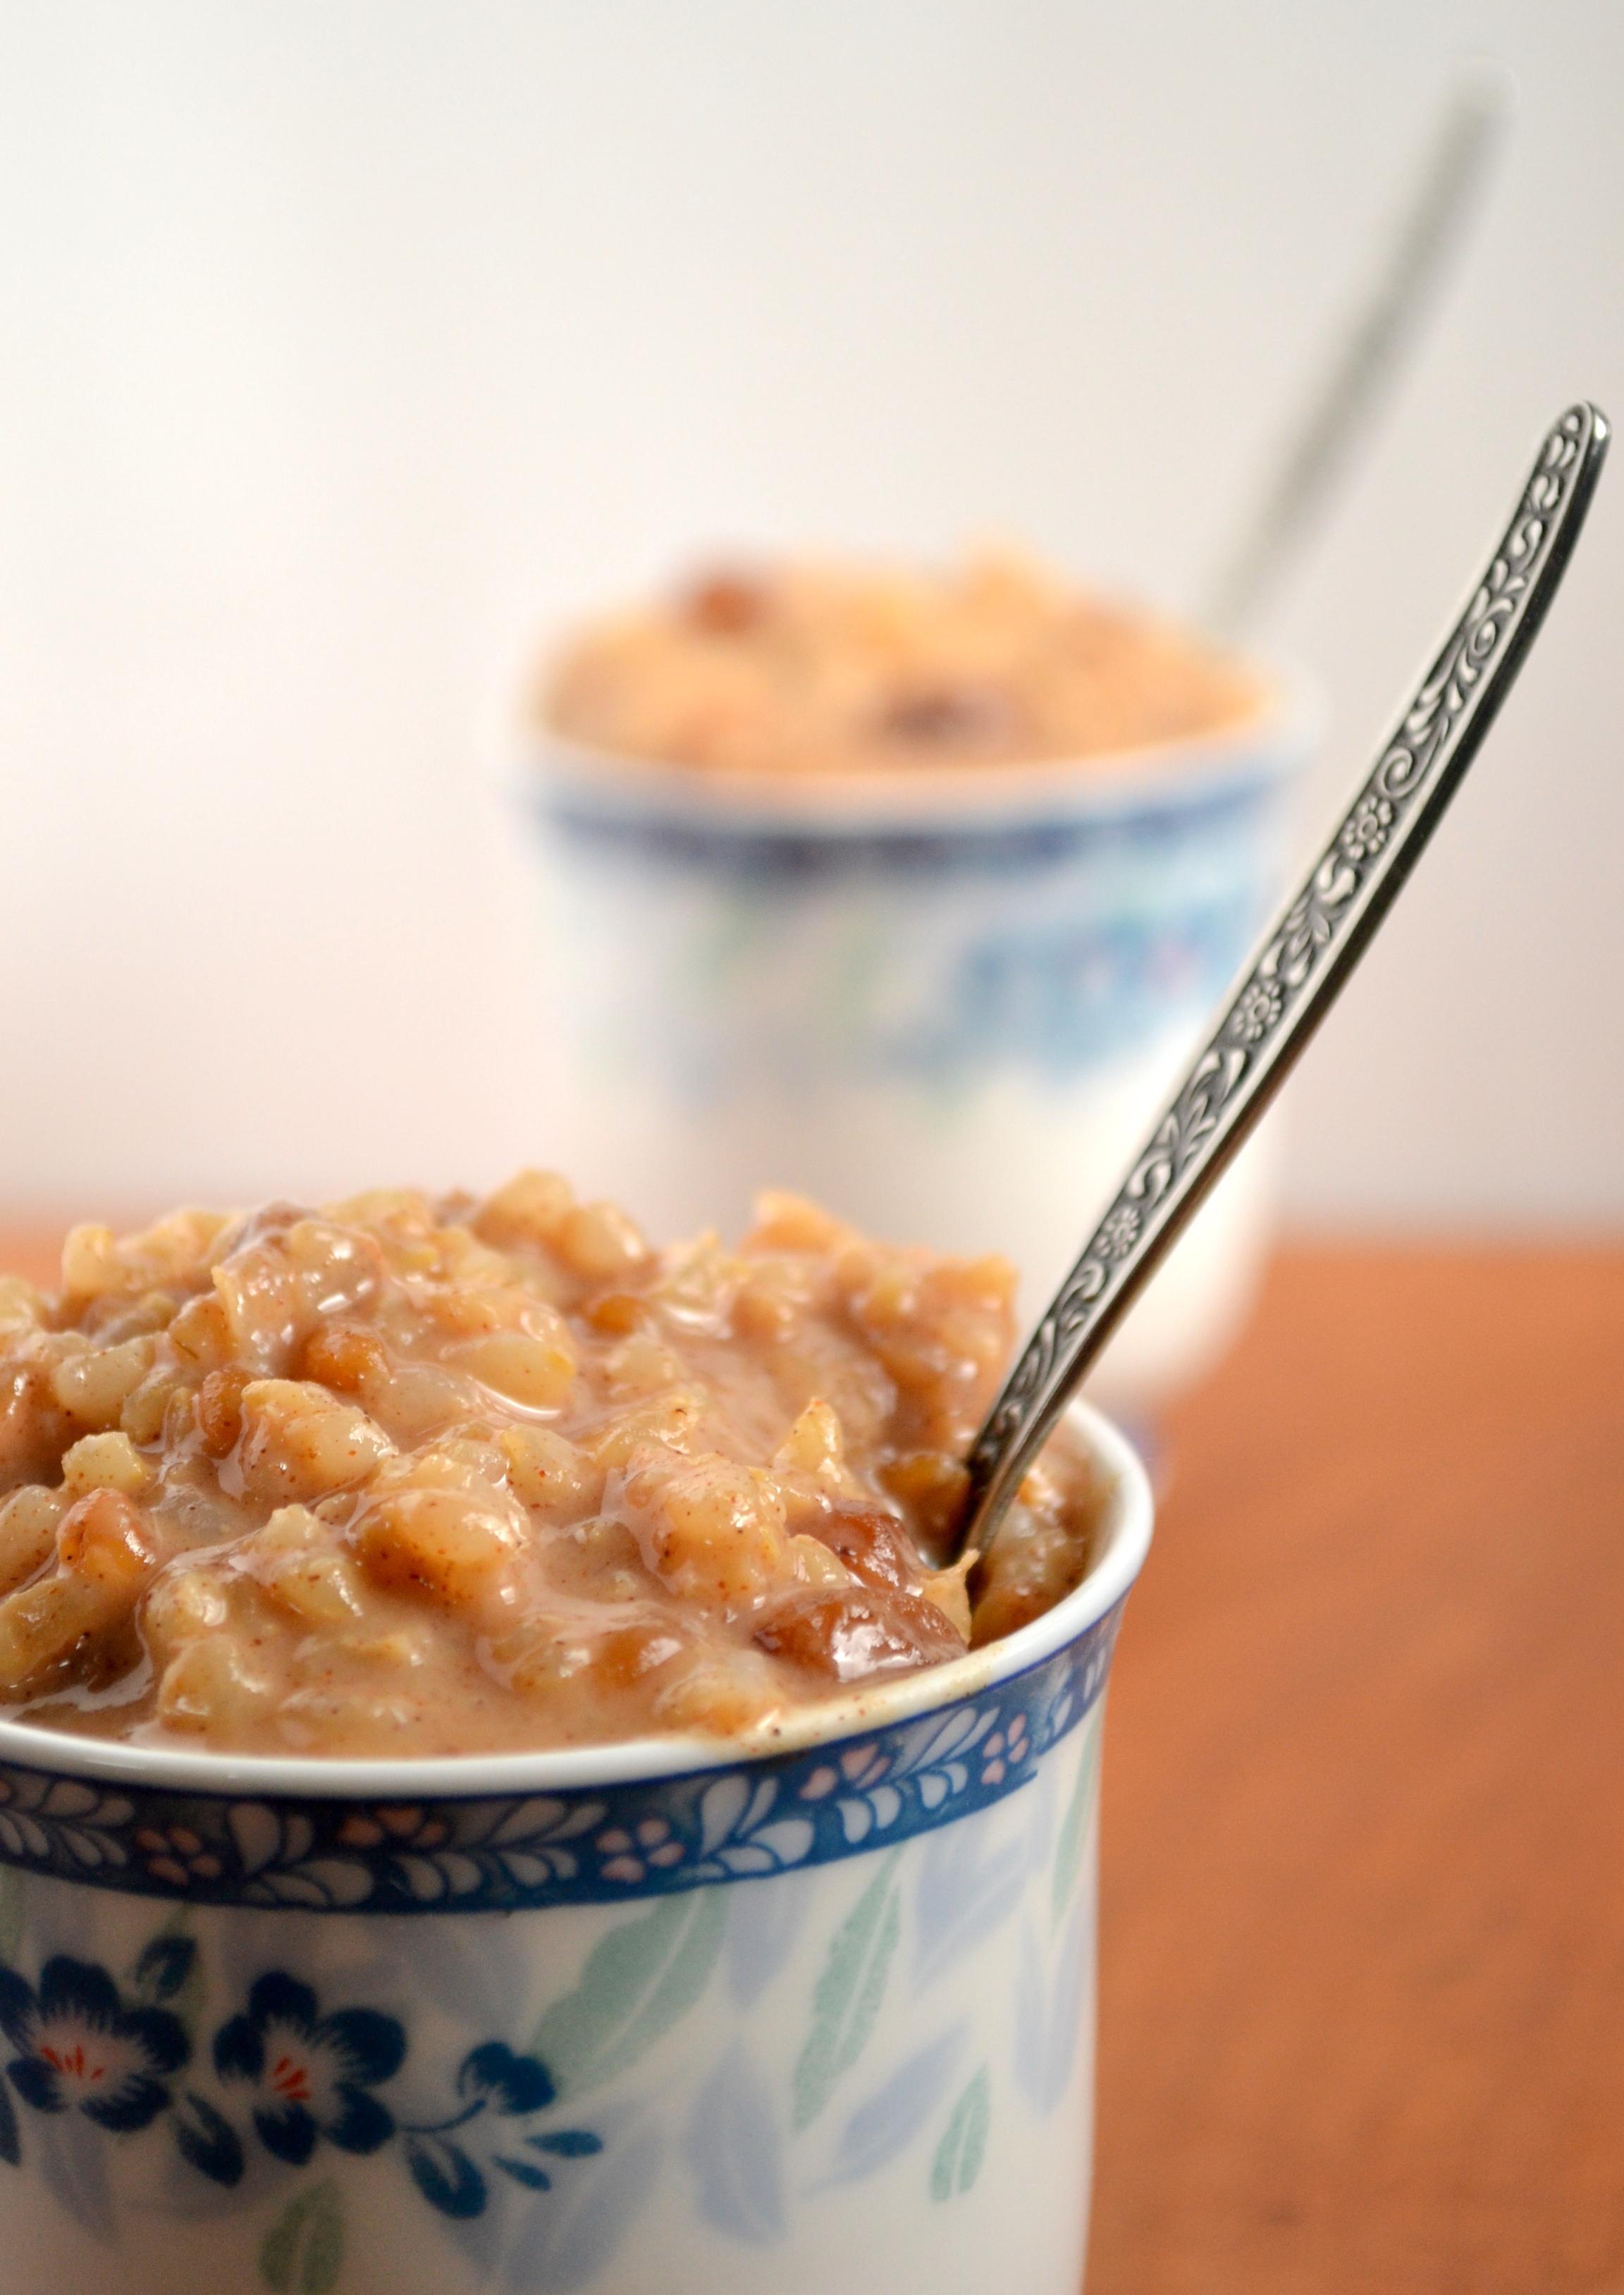 Cinnamon Raisin Brown Rice Pudding